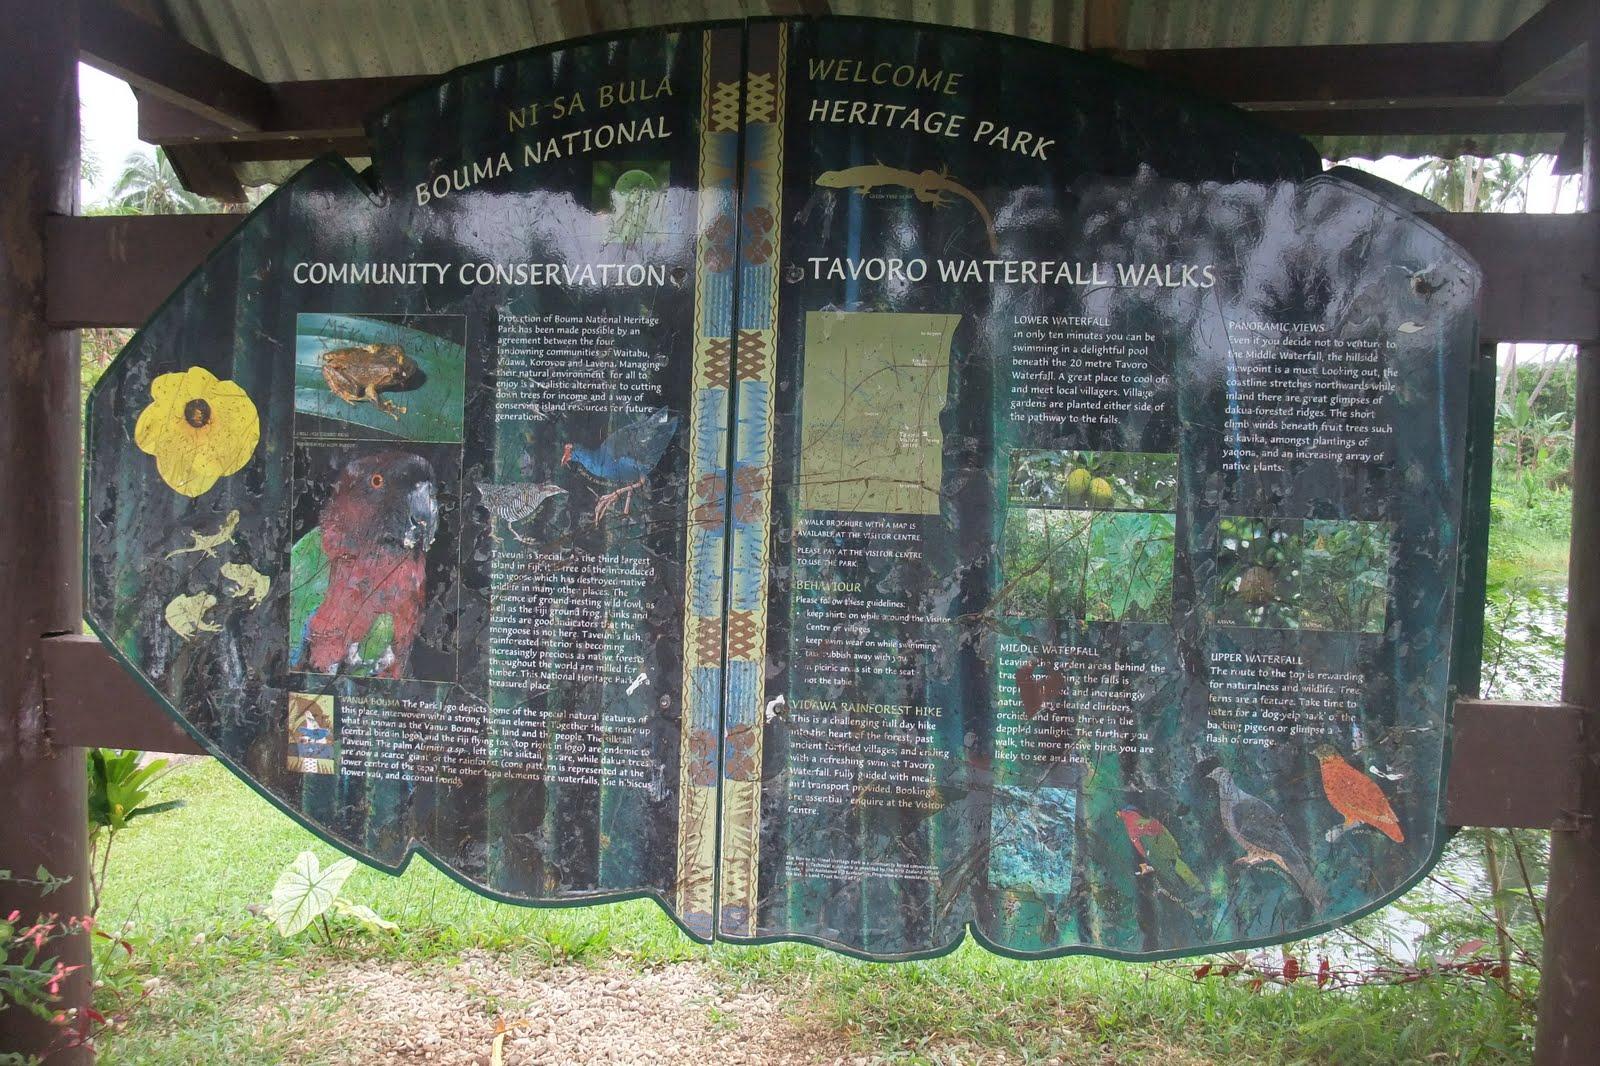 http://3.bp.blogspot.com/-yNhuYjL7Gtw/TiEnezBqmmI/AAAAAAAAARo/KgIEy05i3mc/s1600/day+14+and+15+taveuni+rtw+fiji+099+bouma+national+park.JPG